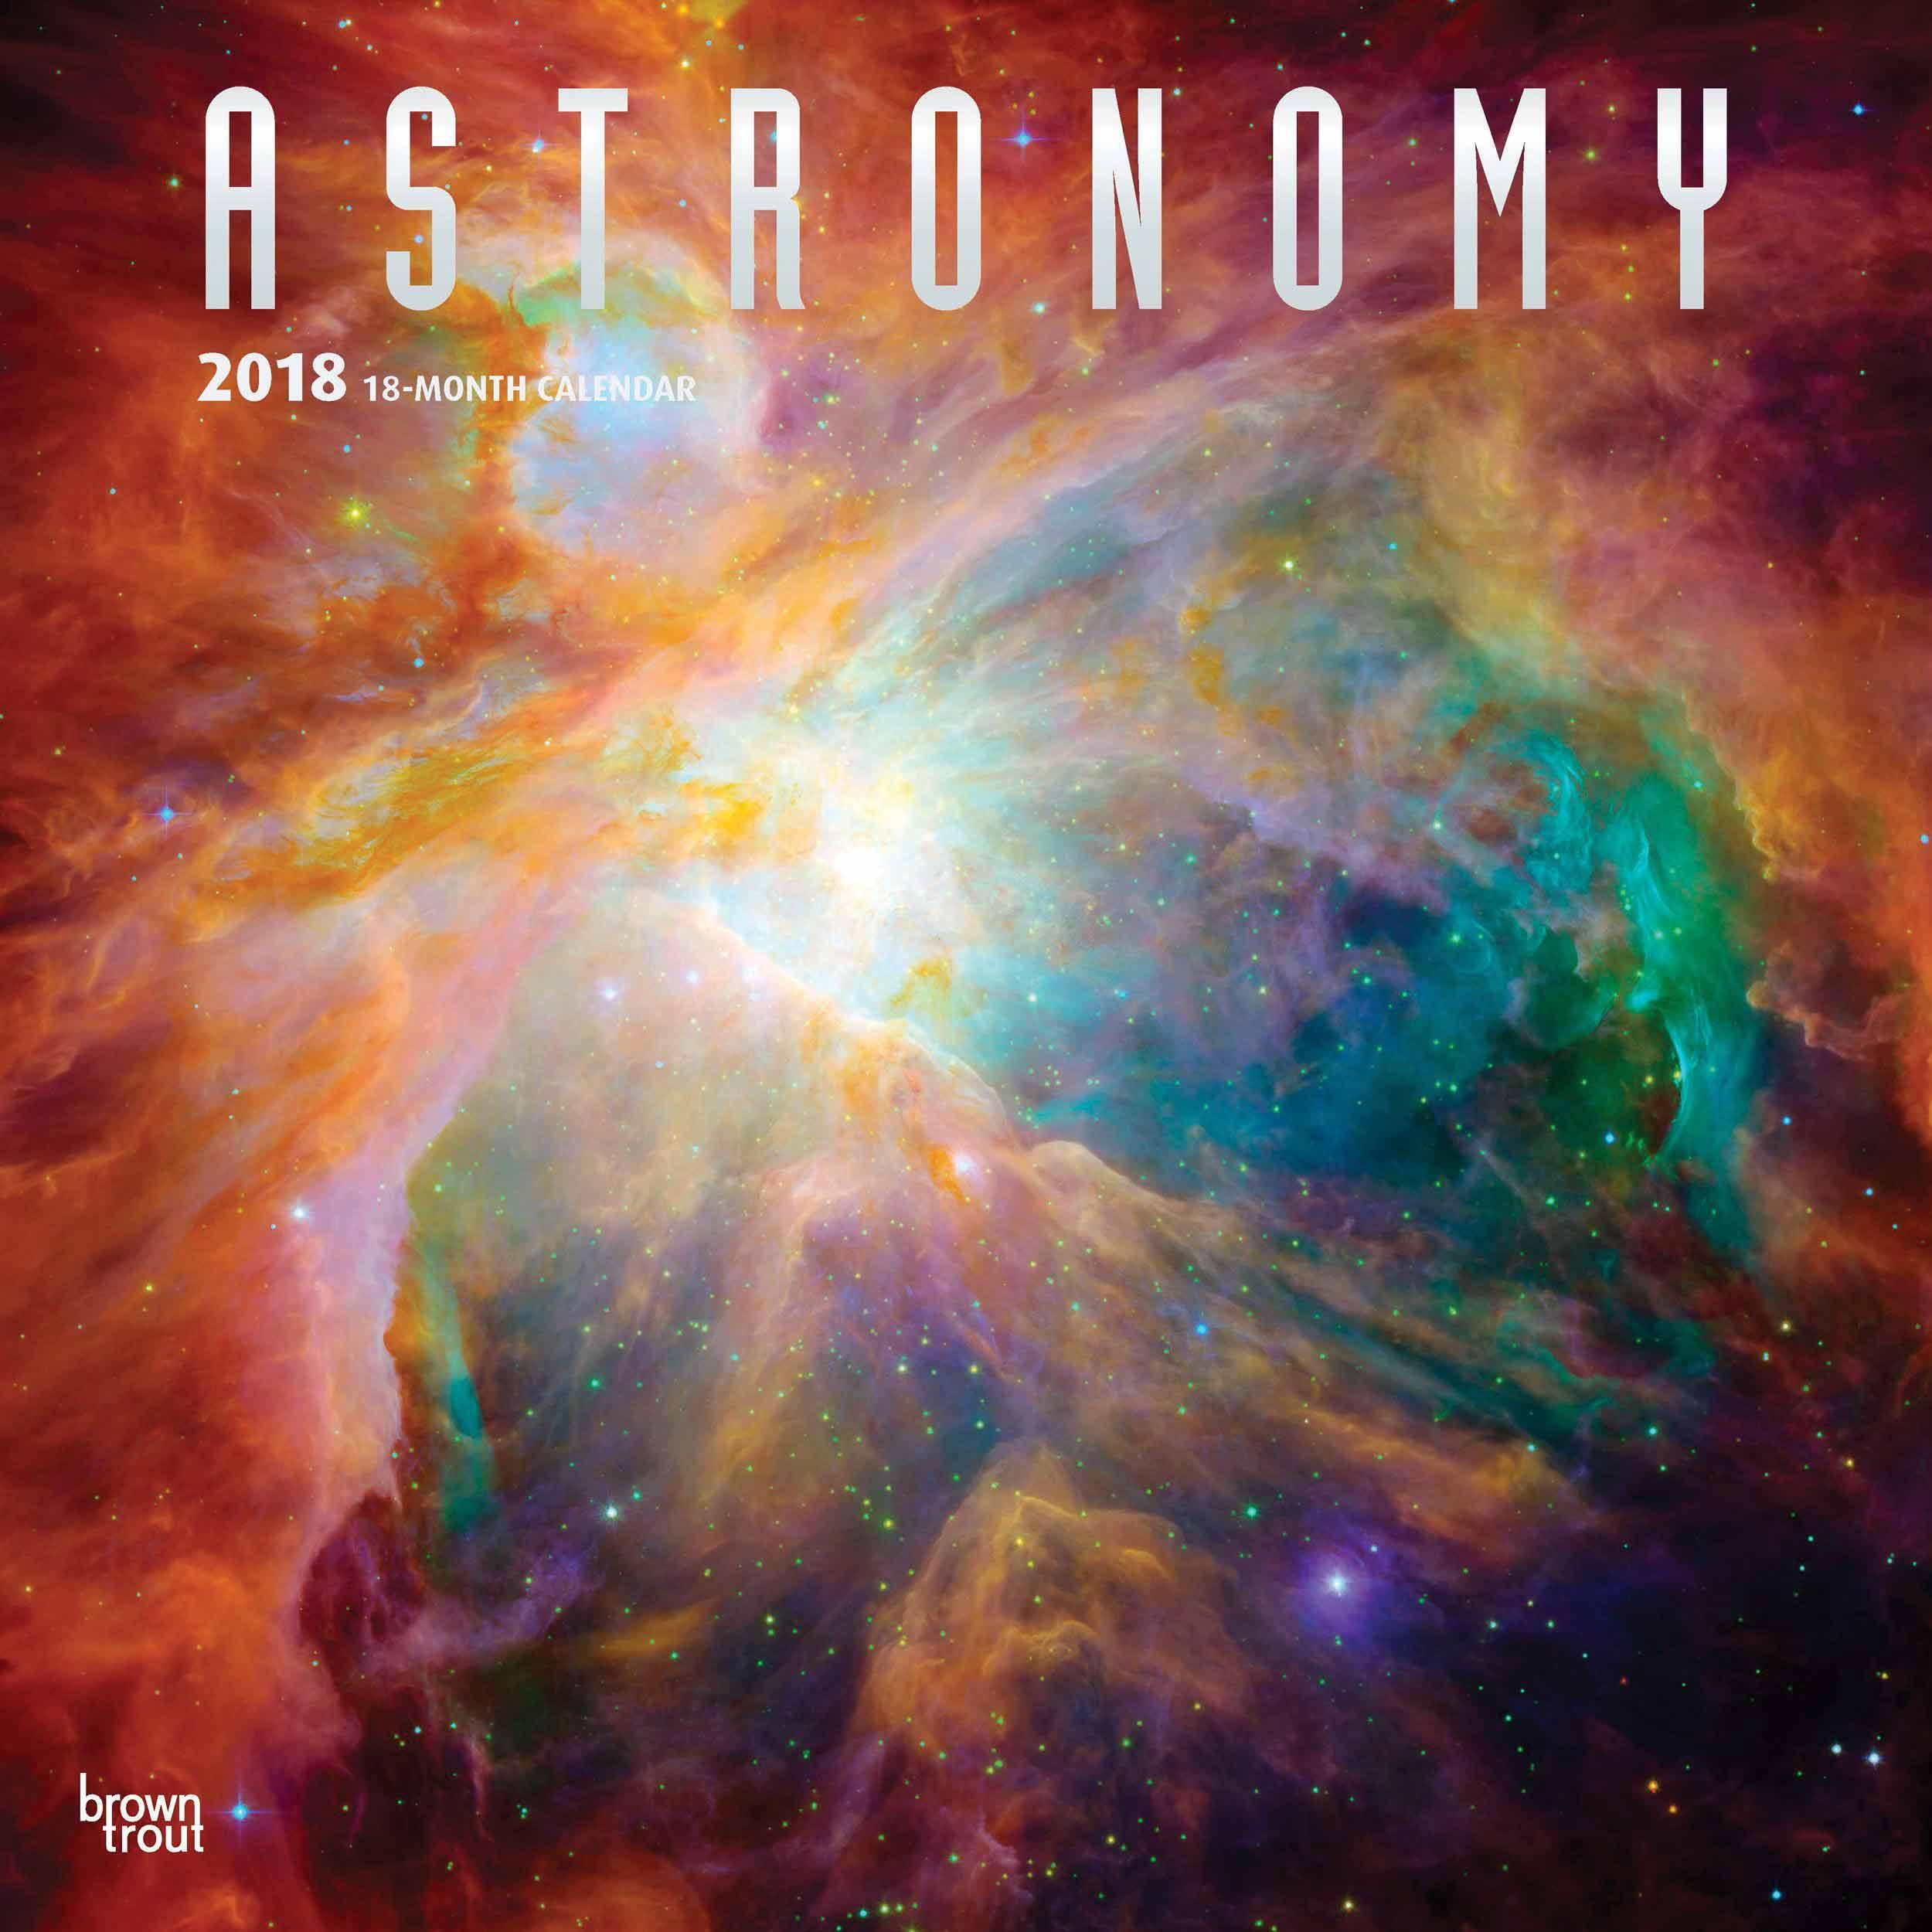 Astronomy Calendar 2020 at Calendar Club